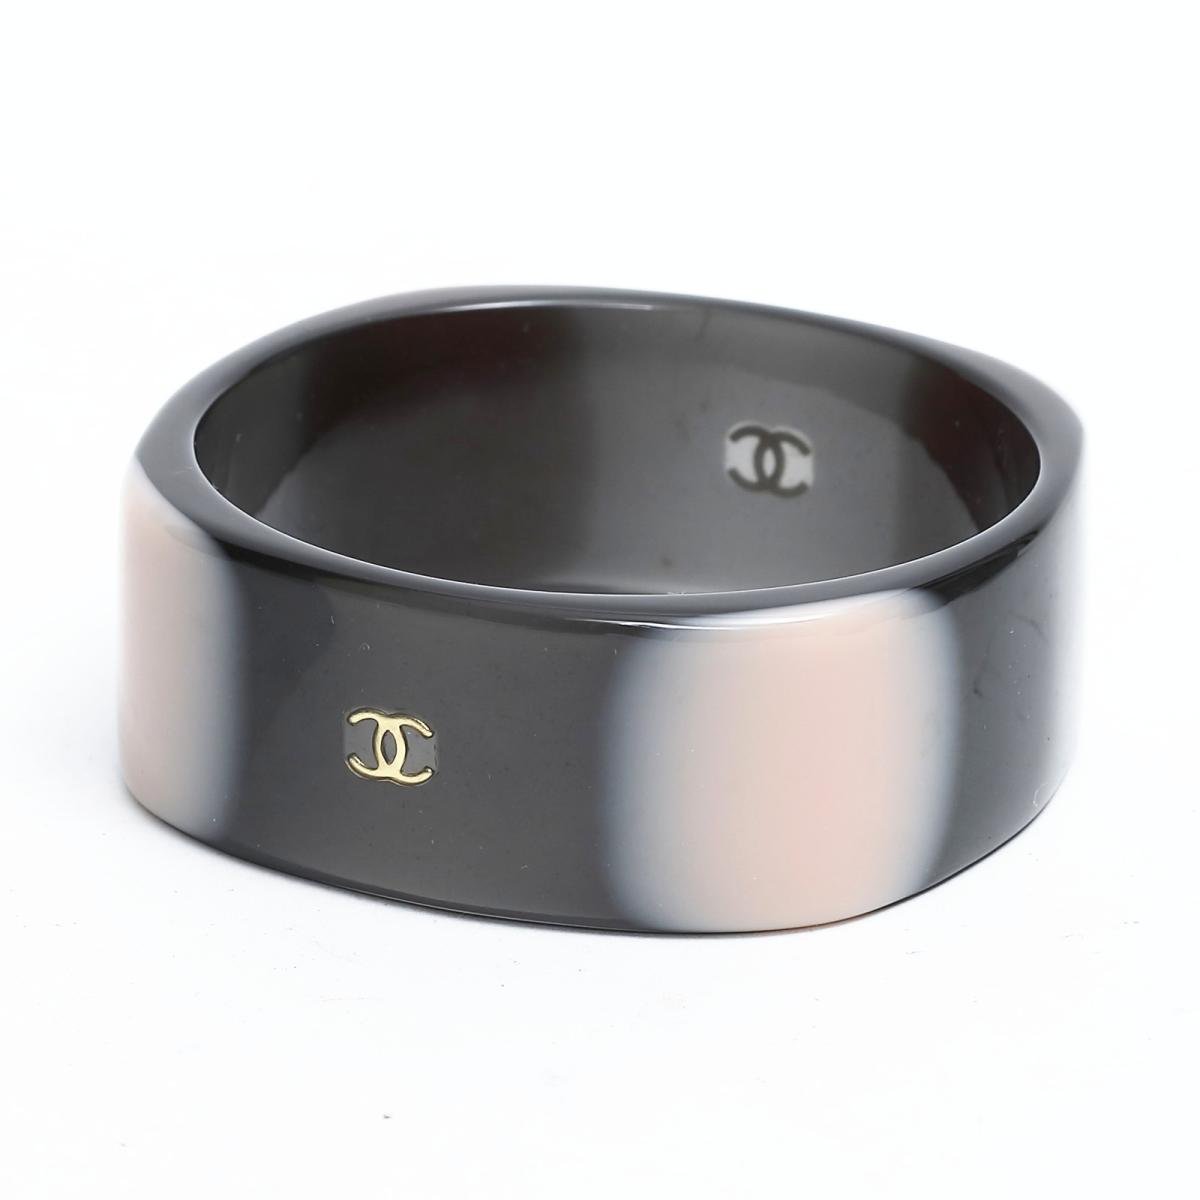 8169ed48a051 シャネル 01Aバングル ブレスレット アクセサリー レディース プラスチック ブラック x ピンク | CHANEL BRANDOFF ブランドオフ  ブランド